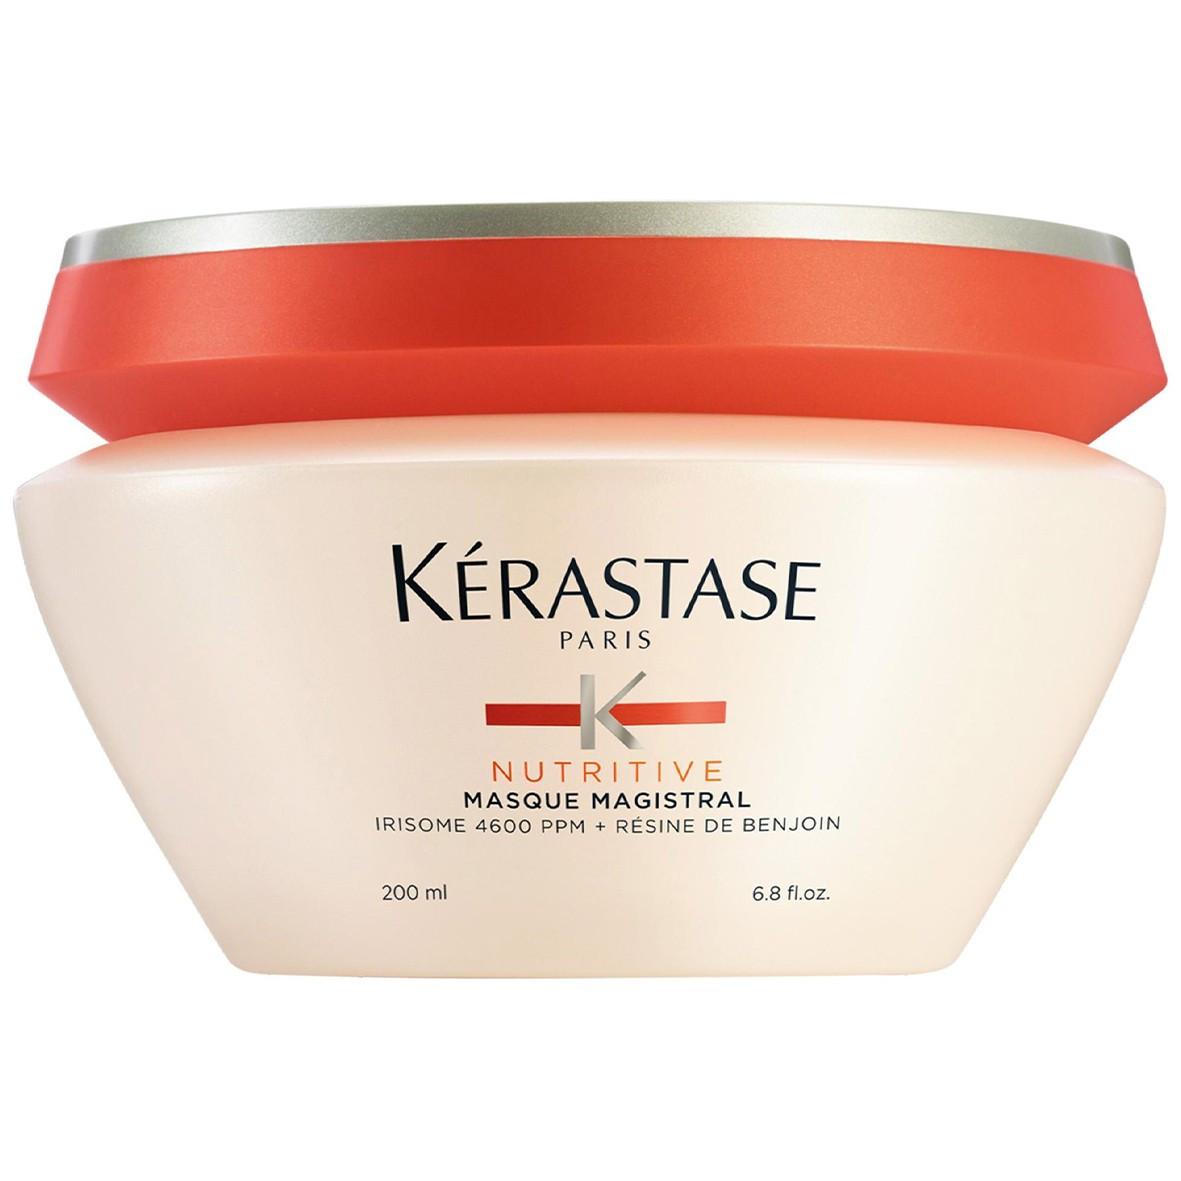 Маска для інтенсивного живлення сухого волосся Kerastase Nutritive Masque Magistral